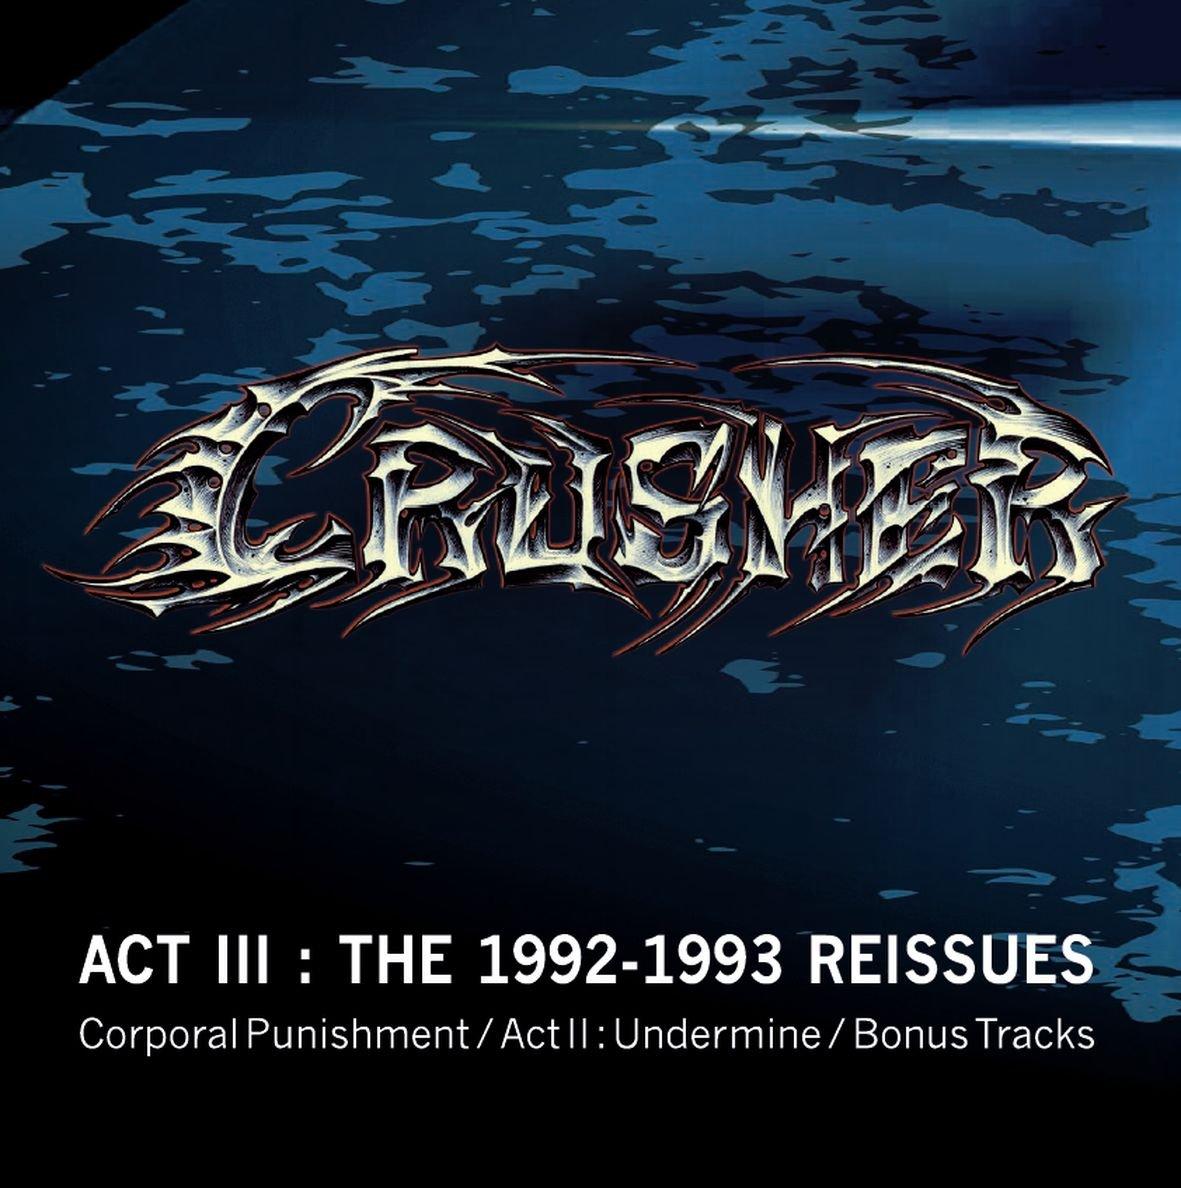 Act III - the 1992-1993 Reissues (Corporal Punishment - Acte II Undermine - Bonus Tracks)